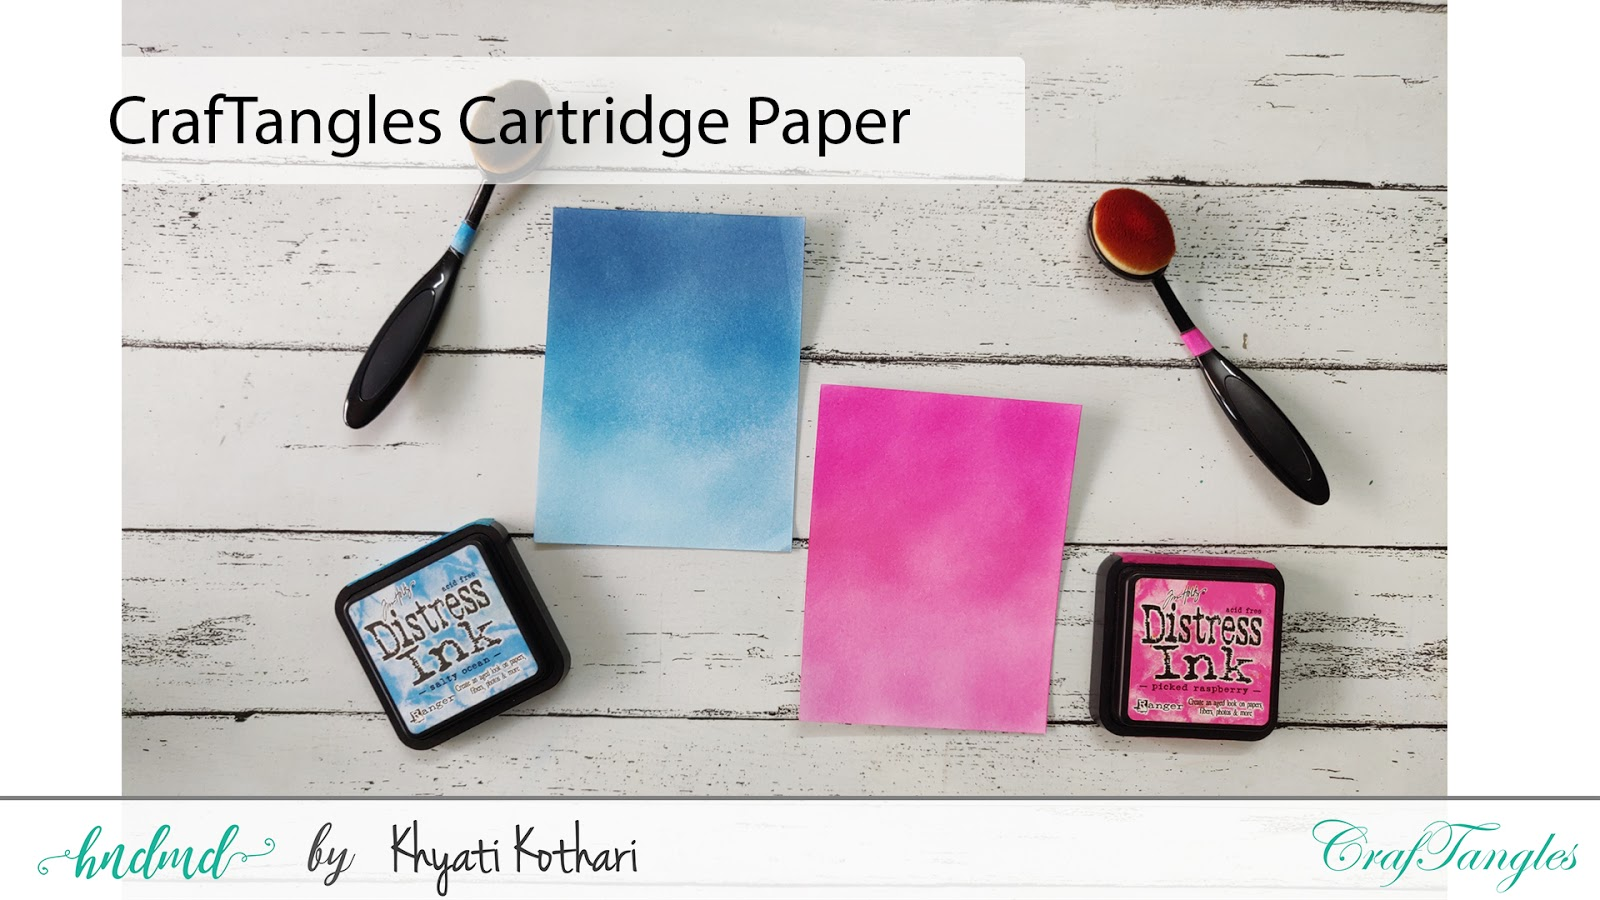 Introducing CrafTangles Ink blending brushes 6